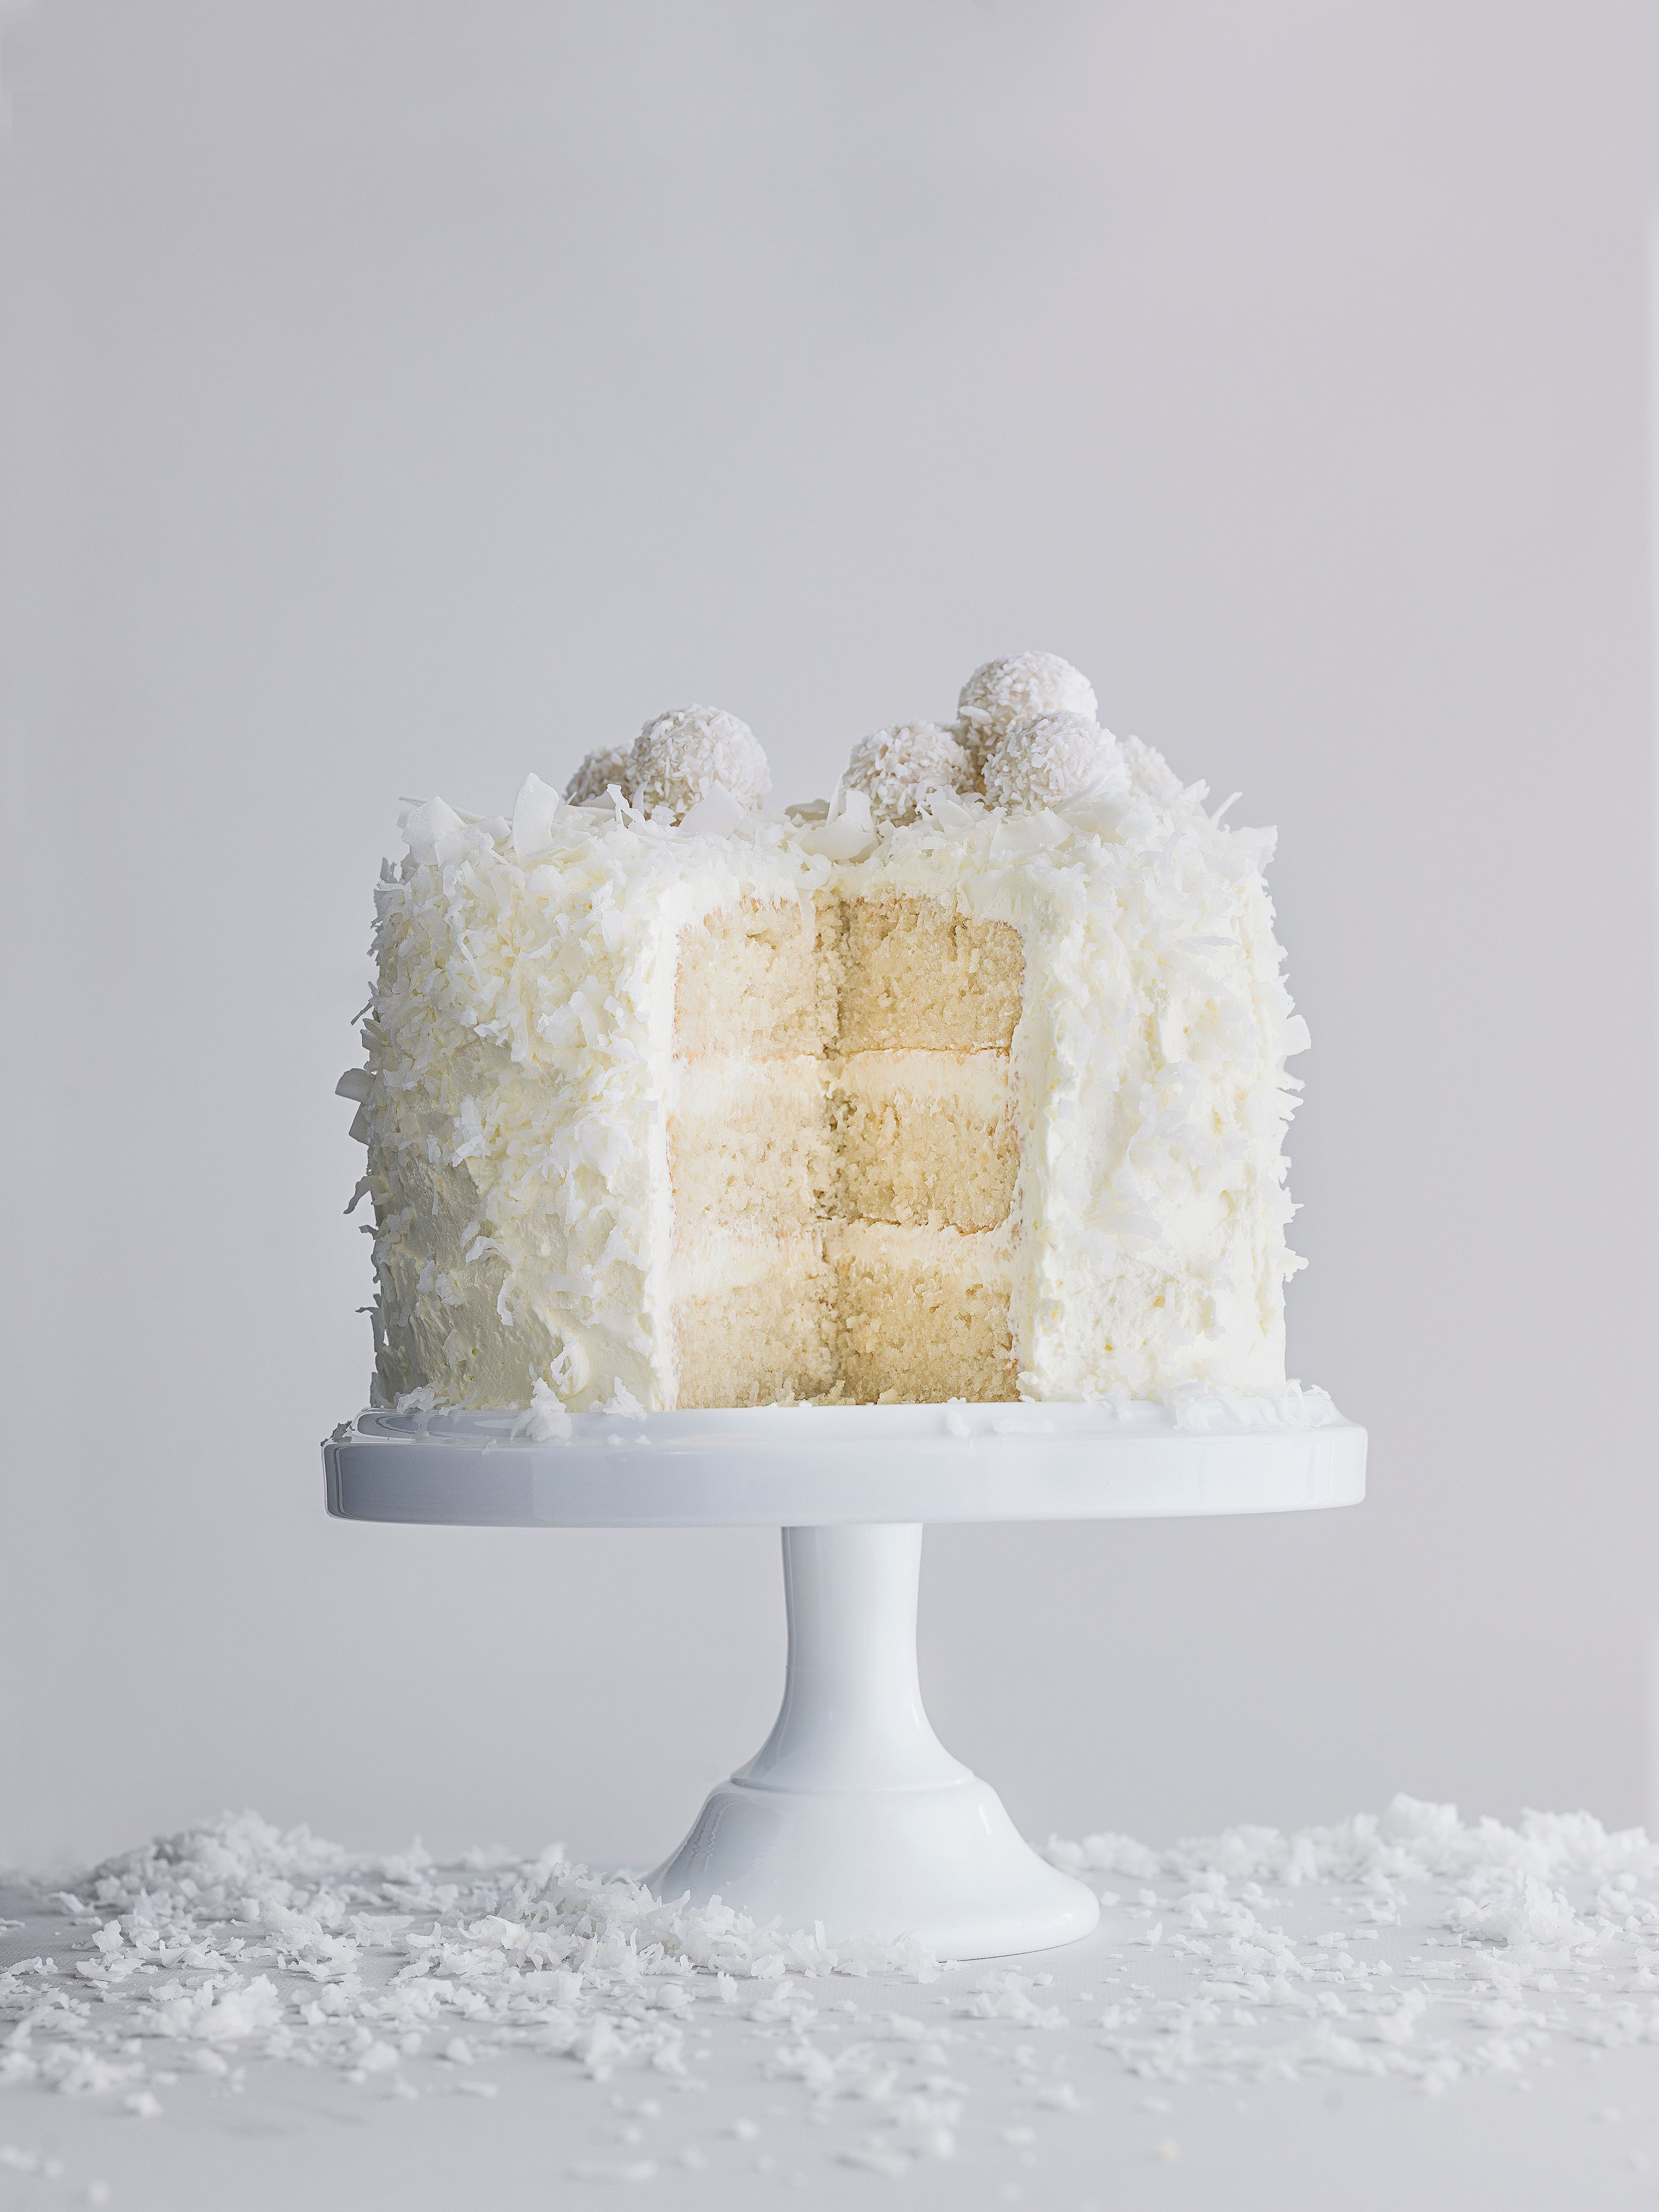 White velvet snowball cake | Christmas 2016, Coconut and White chocolate